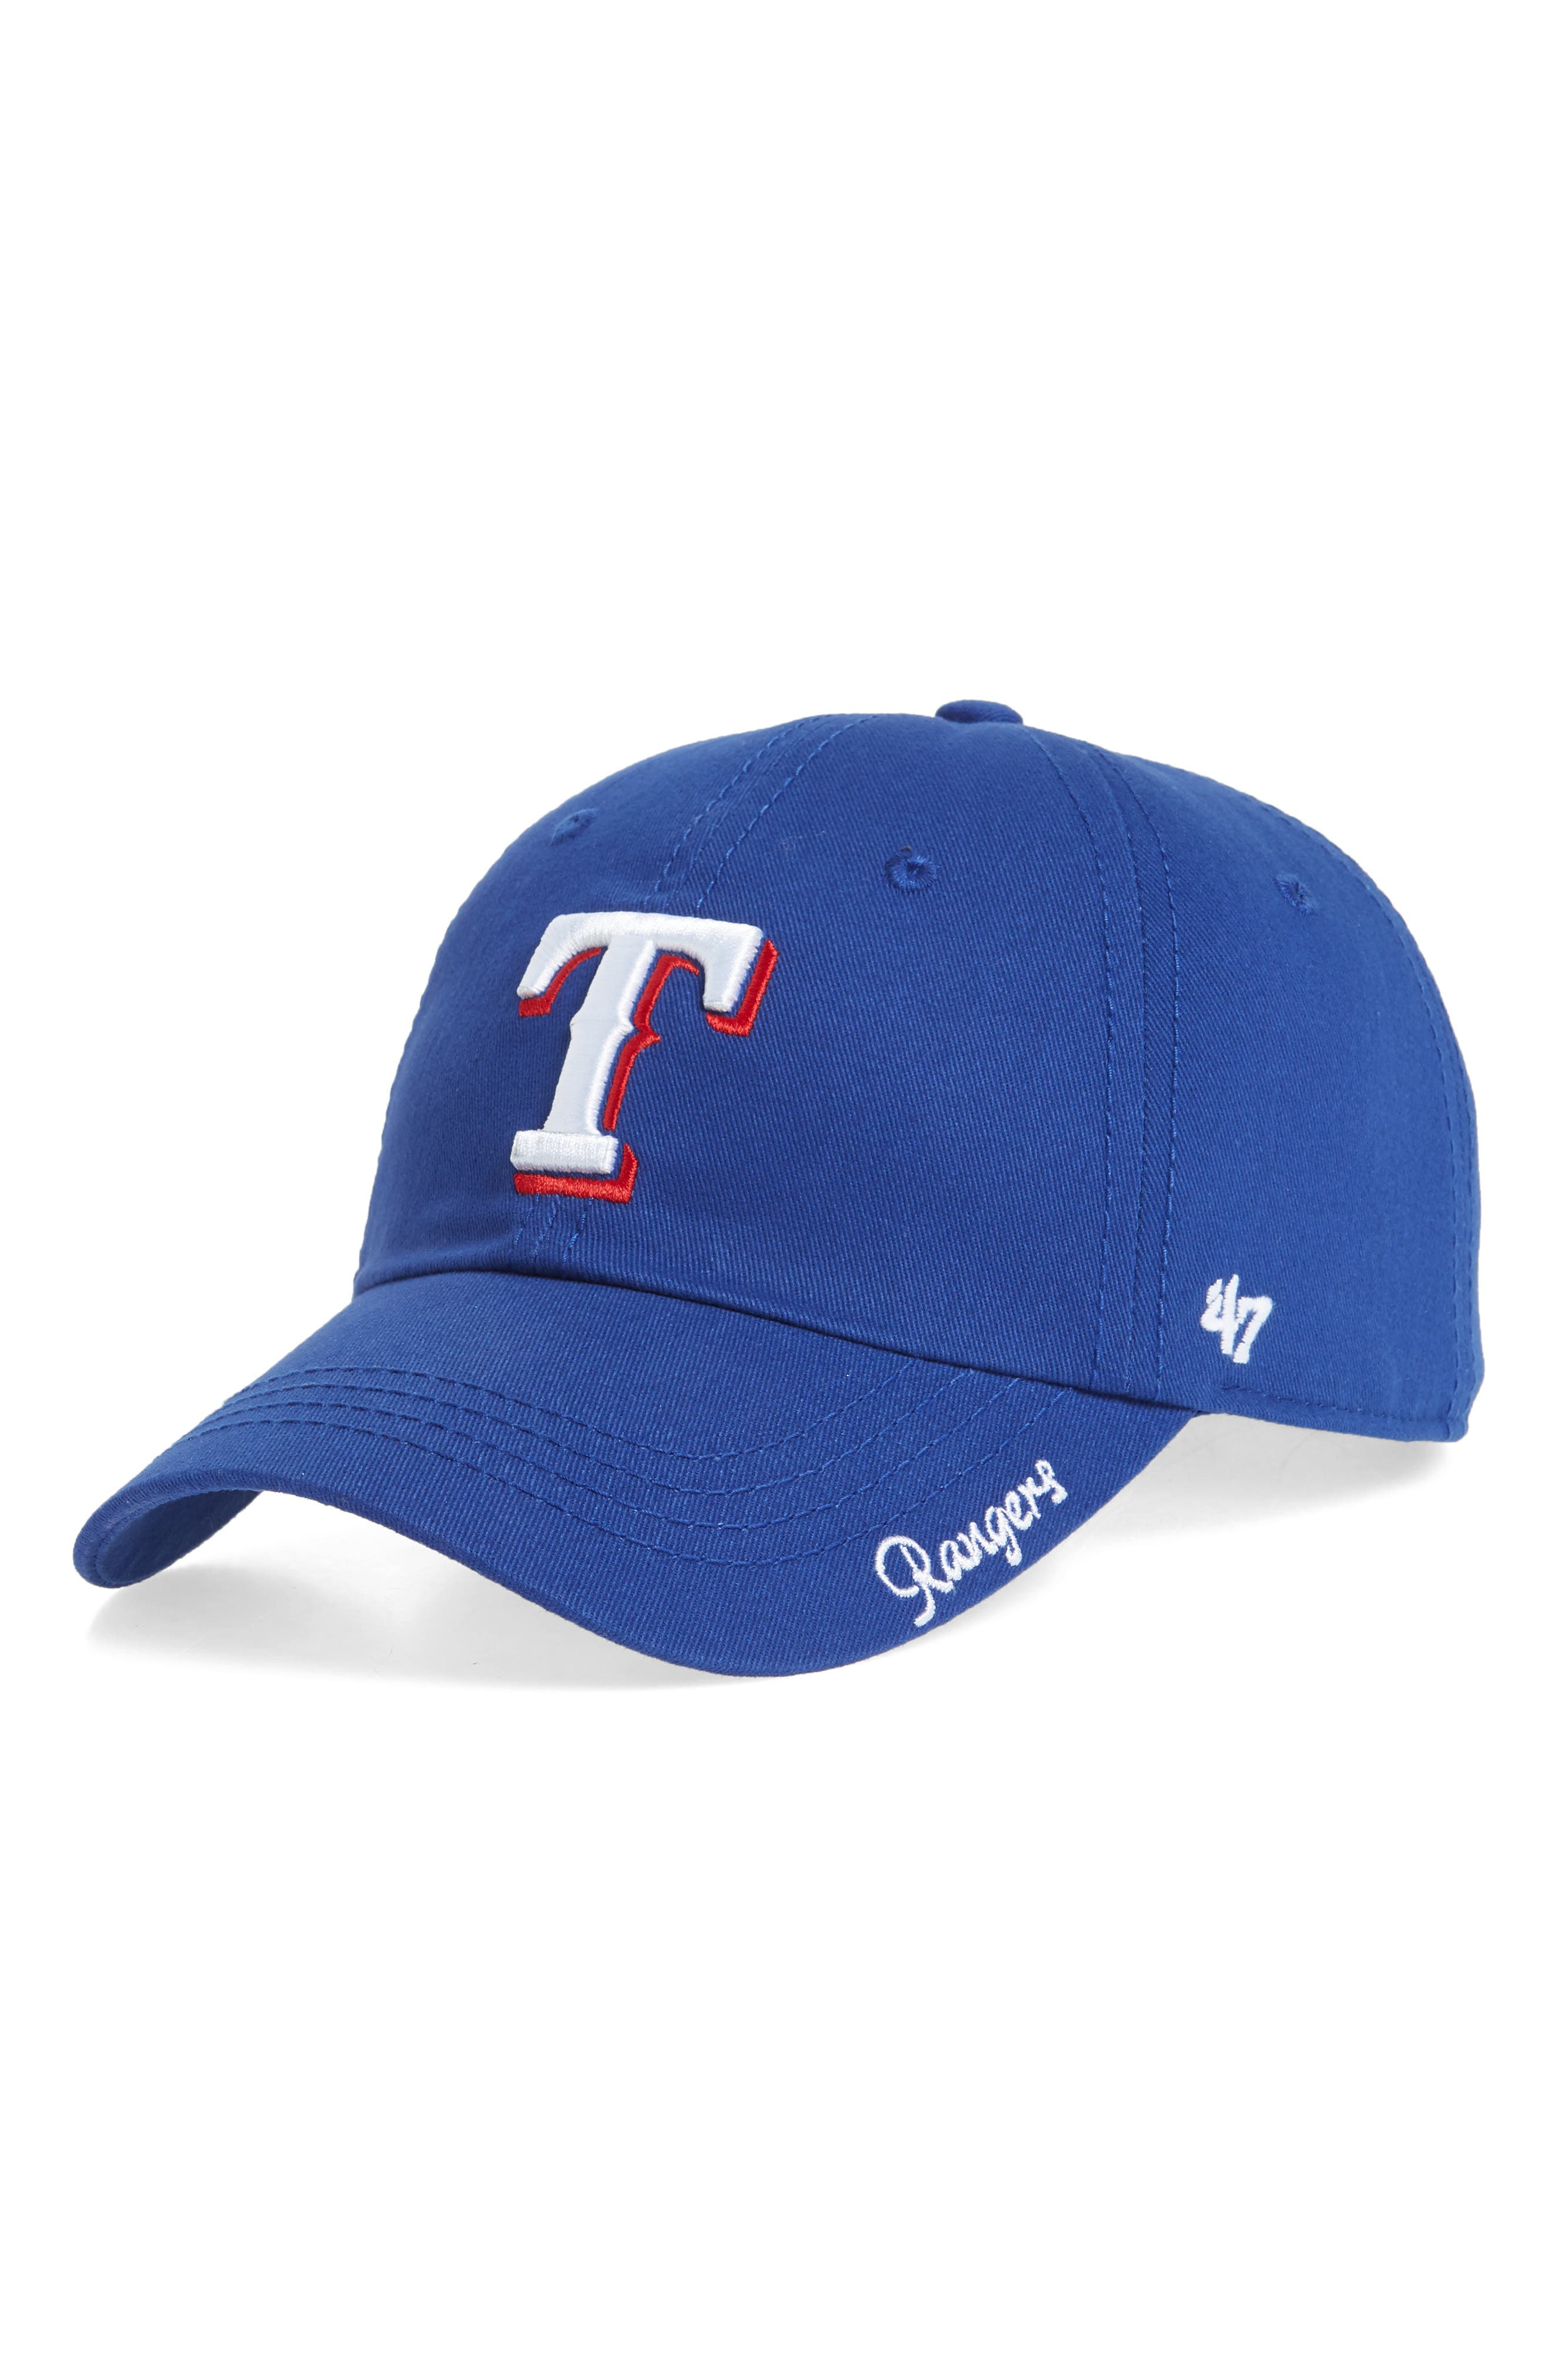 Miata Clean-Up Texas Rangers Baseball Cap,                             Main thumbnail 1, color,                             400